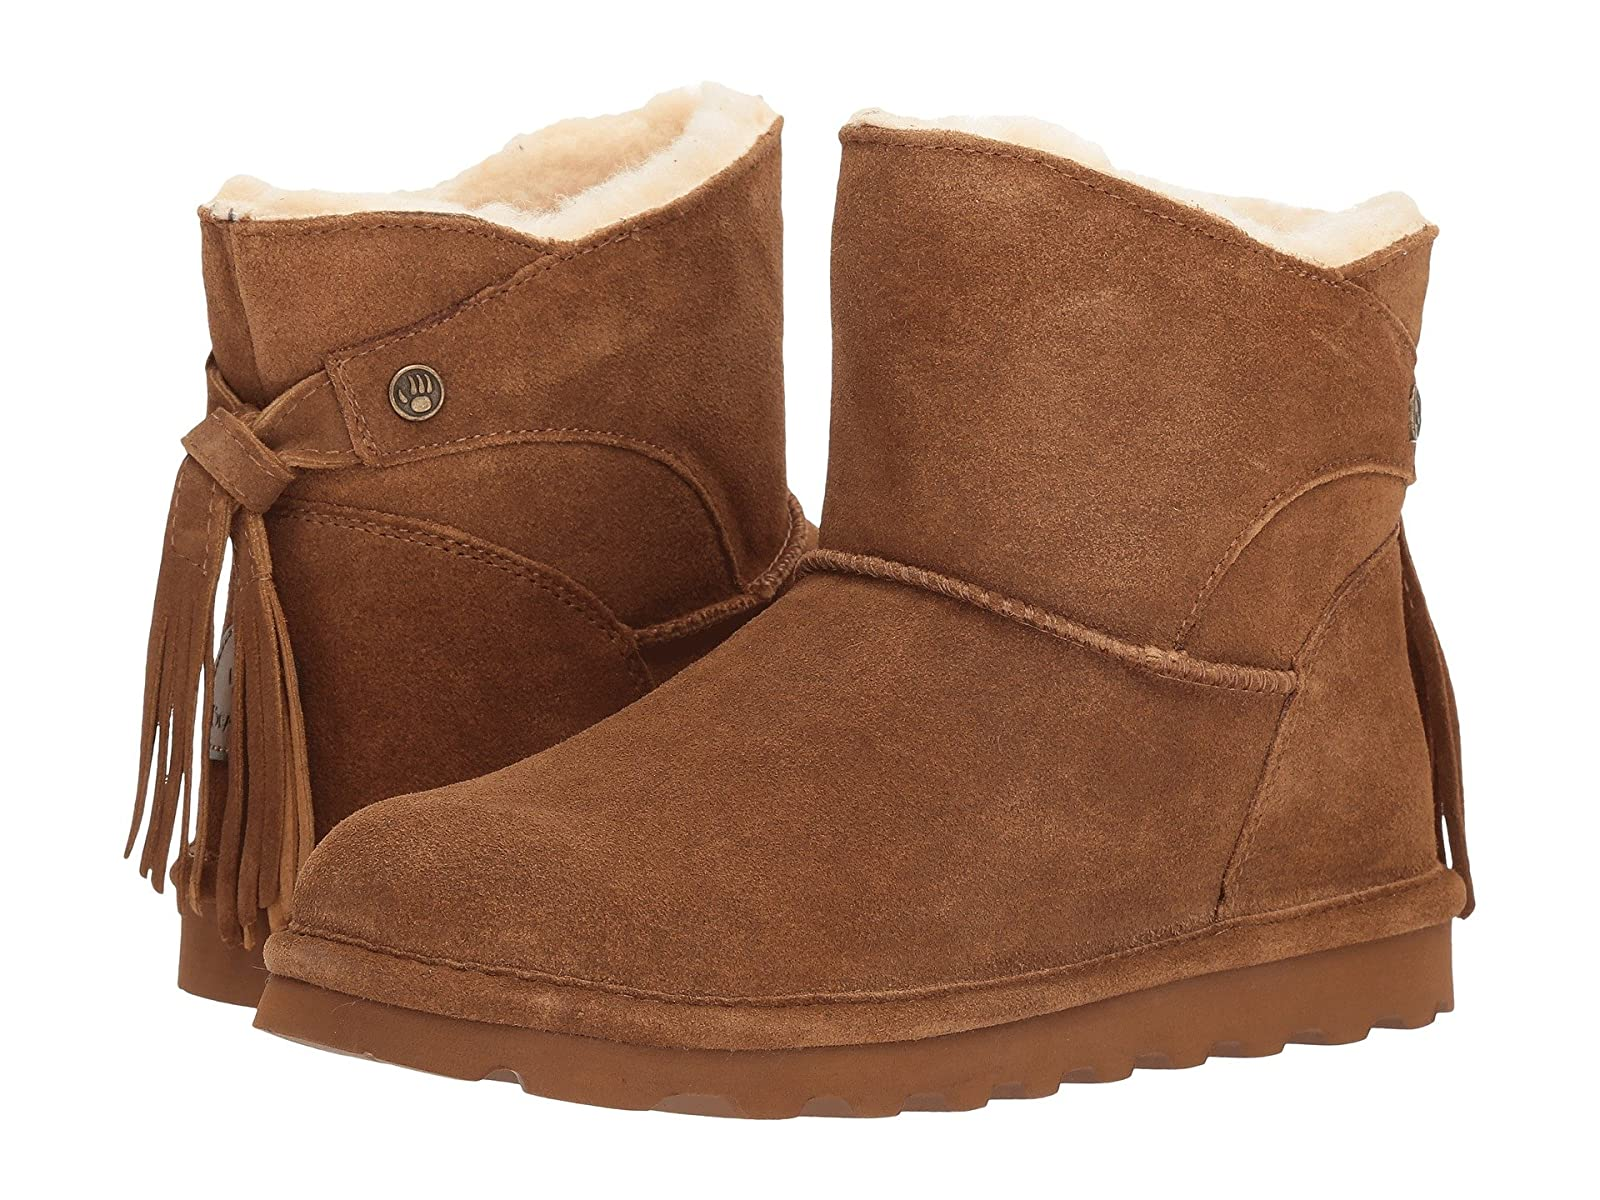 Bearpaw NataliaCheap and distinctive eye-catching shoes